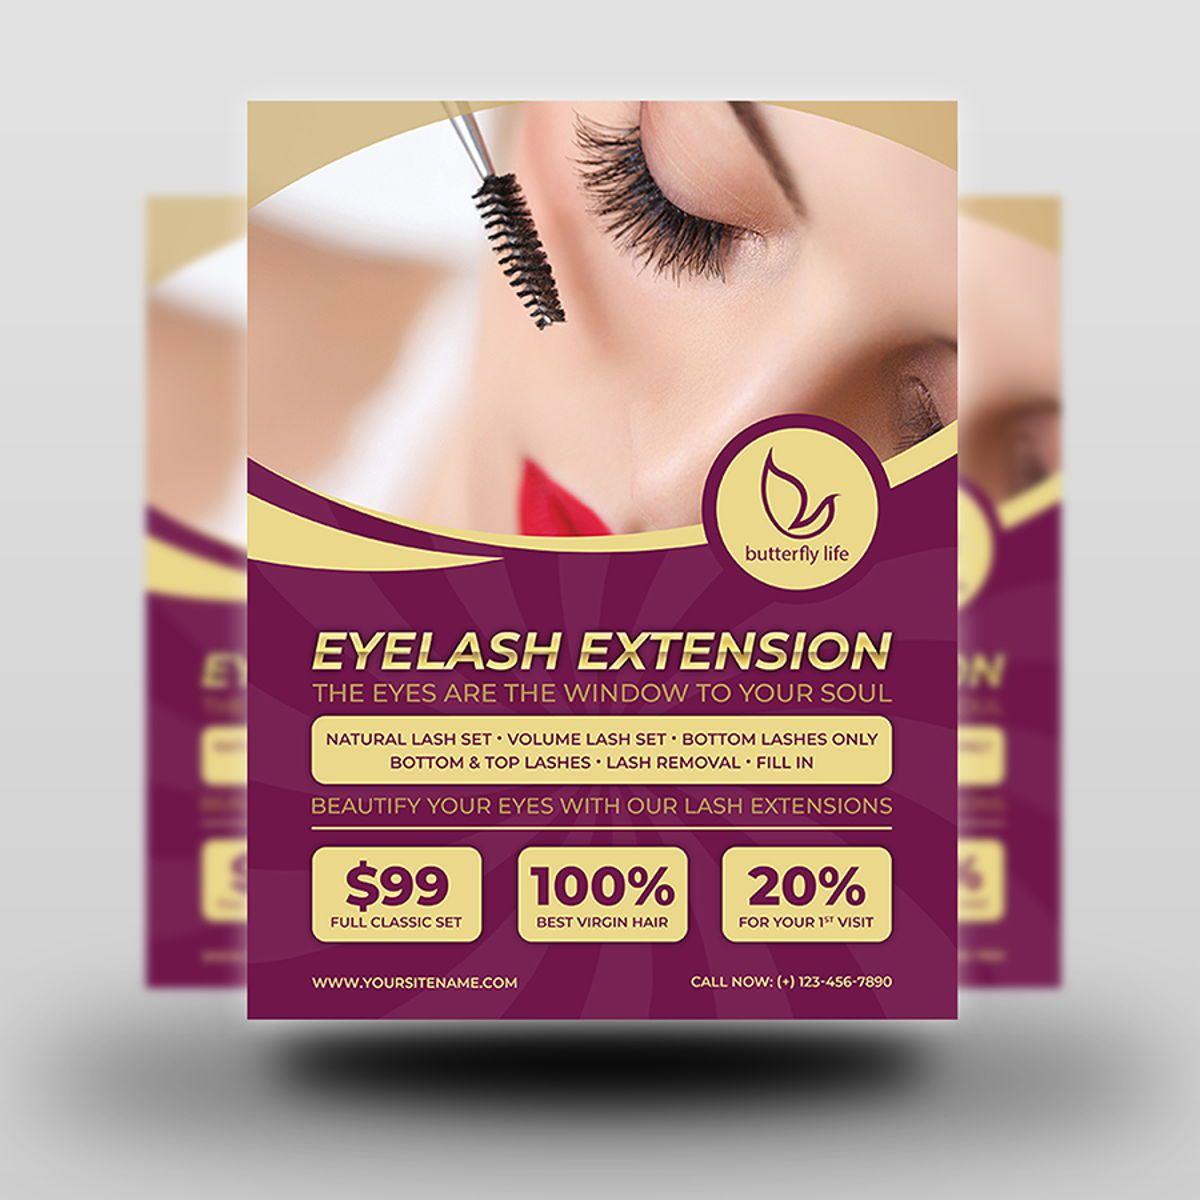 Eyelash Extension Flyer Template, Diapositive 2, 08501, Général — PoweredTemplate.com